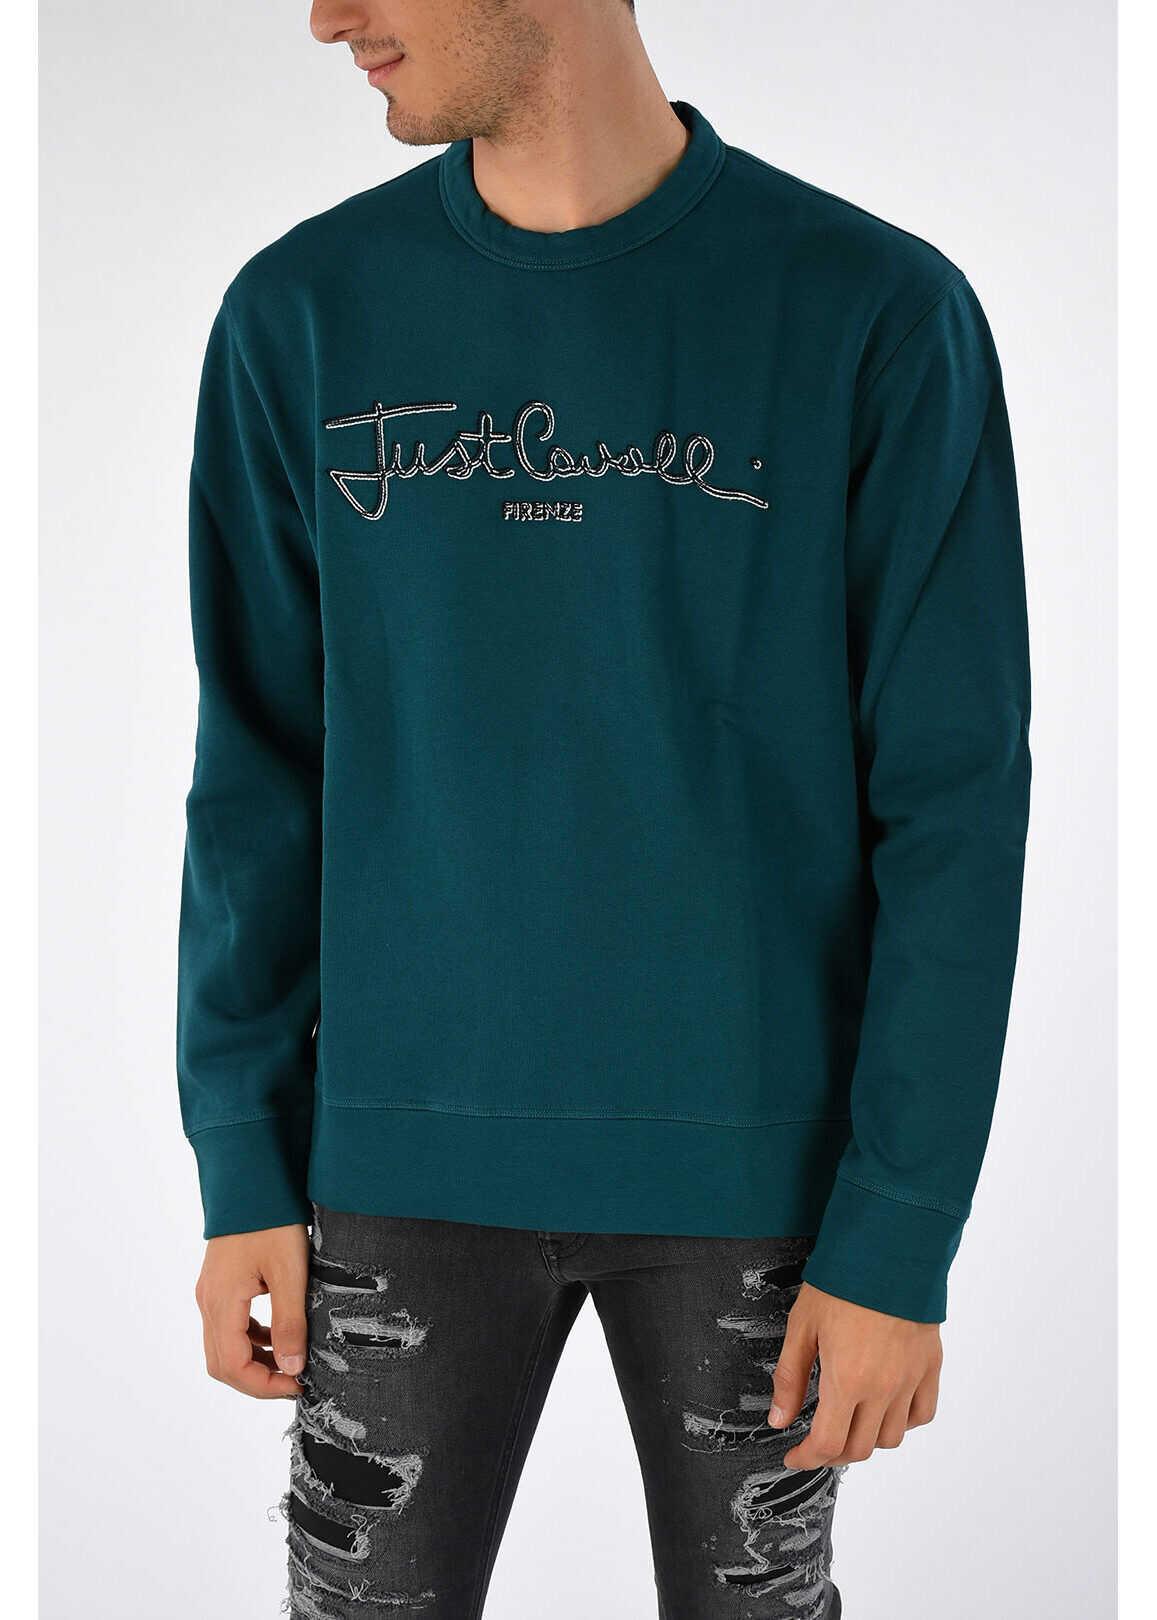 Just Cavalli Embroidered Sweatshirt GREEN